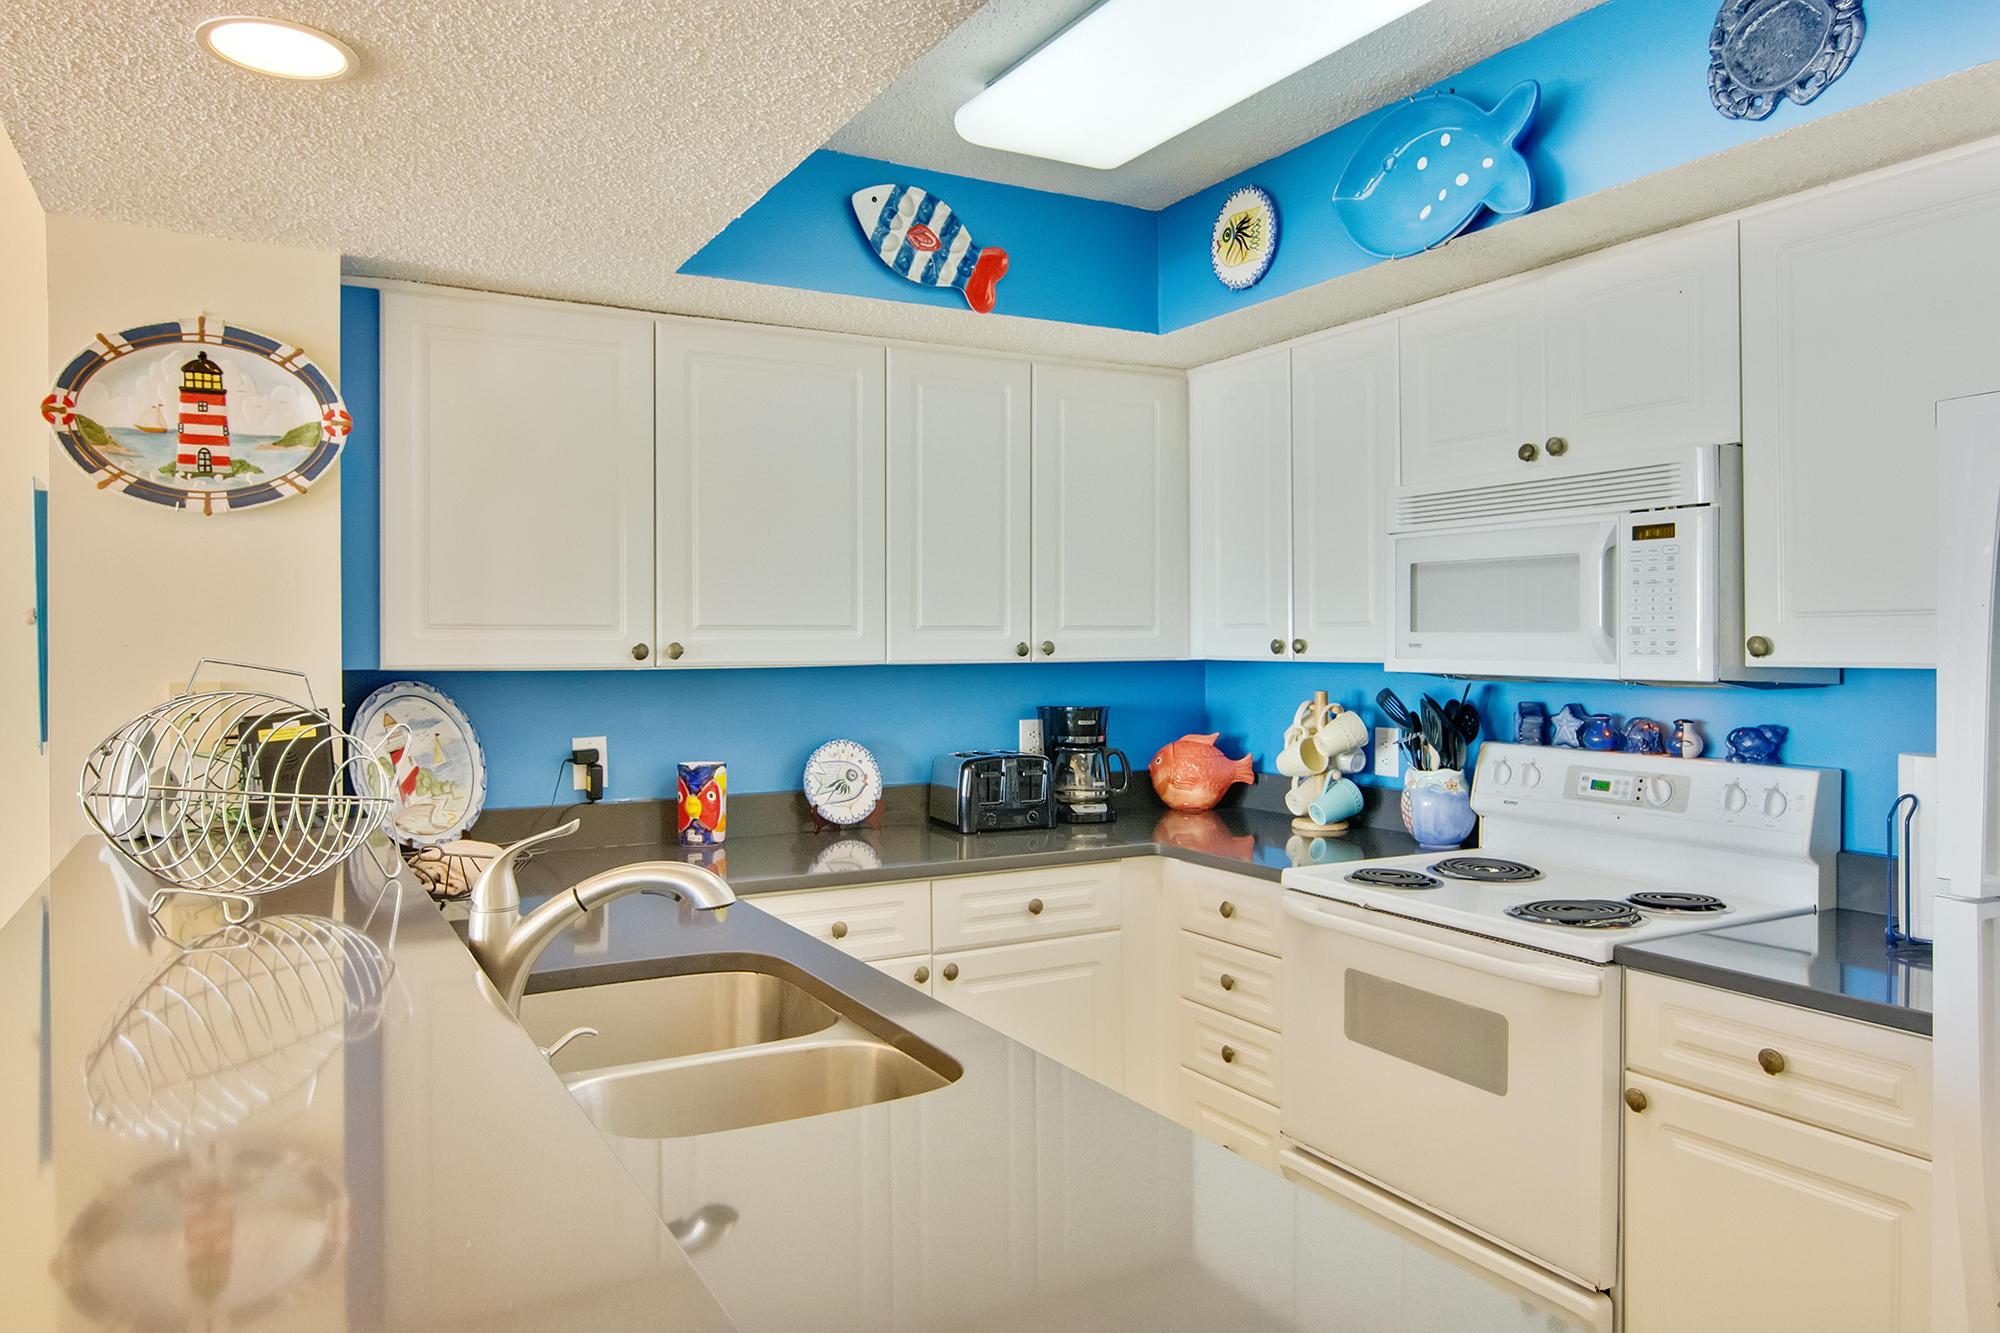 Charleston Oceanfront Villas Homes For Sale - 201 Arctic, Folly Beach, SC - 7